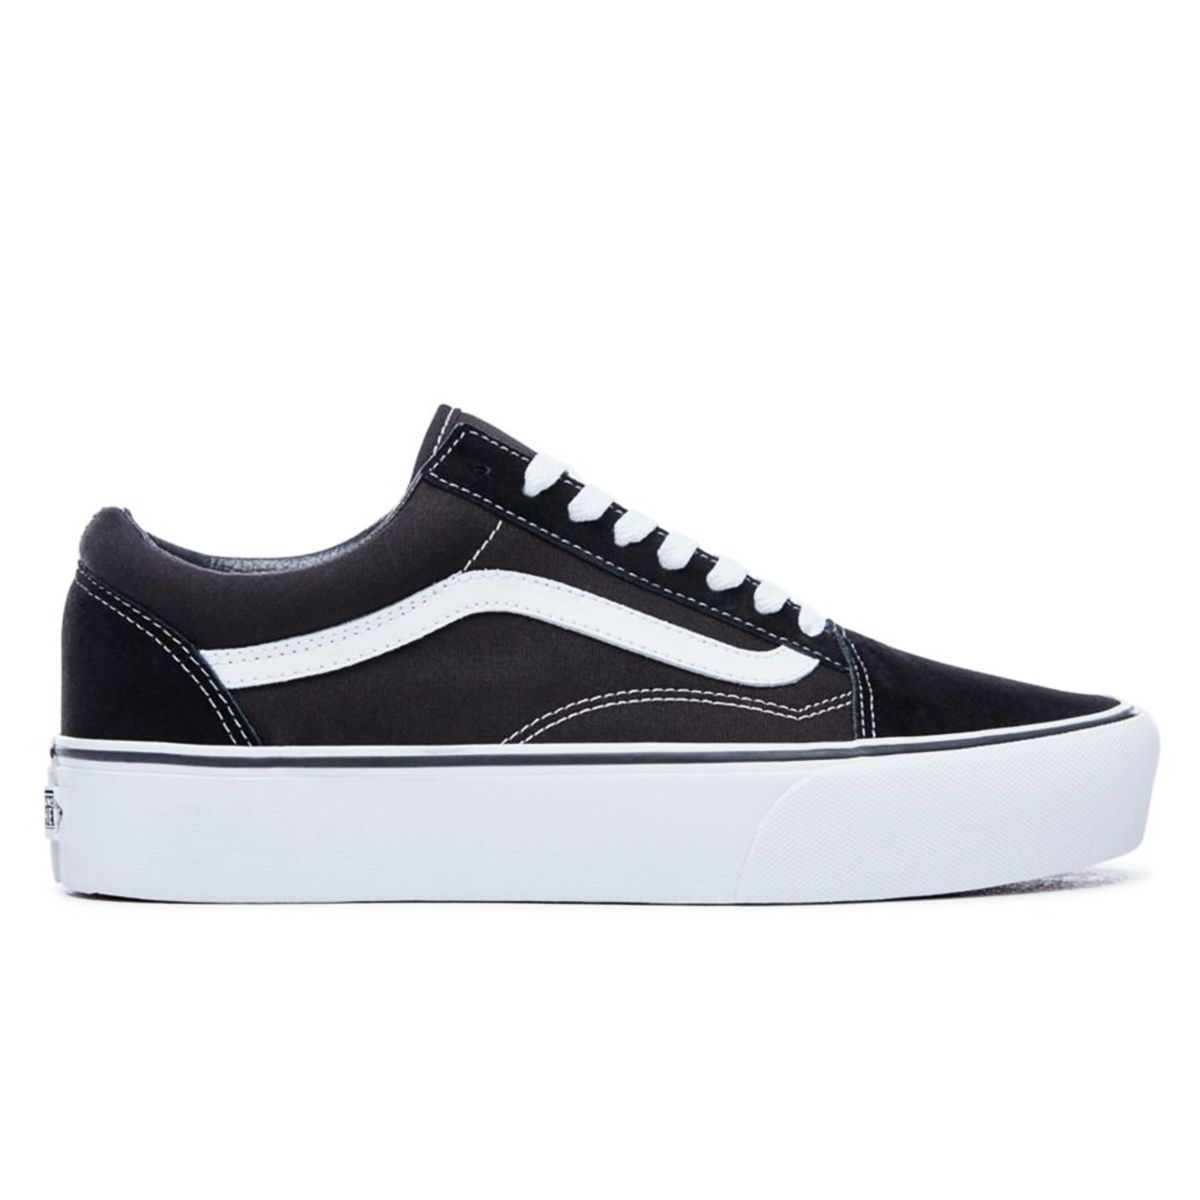 VANS Chaussures compensées Old Skool (Platform)